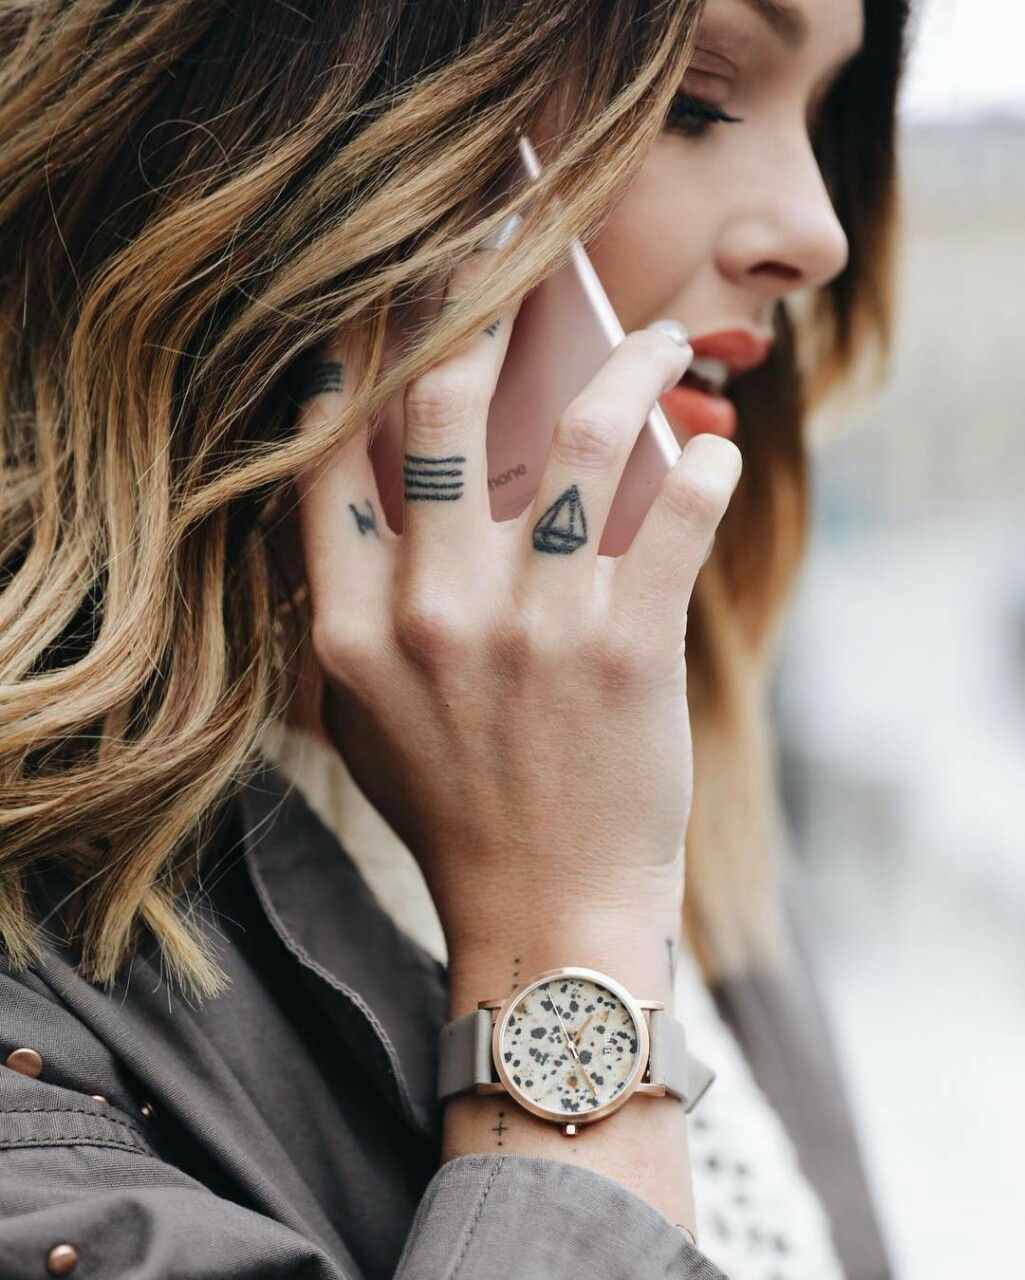 Montre Cluse Caroline Receveur : montre, cluse, caroline, receveur, Caroline, Receveur, Wearing, Cluse, Watch., #spring, #springtime, #springvibes, #carolinereceveur, #french, #frenchgirl, Jewelry, Tattoo,, Fashion,, Fashion, Blogger